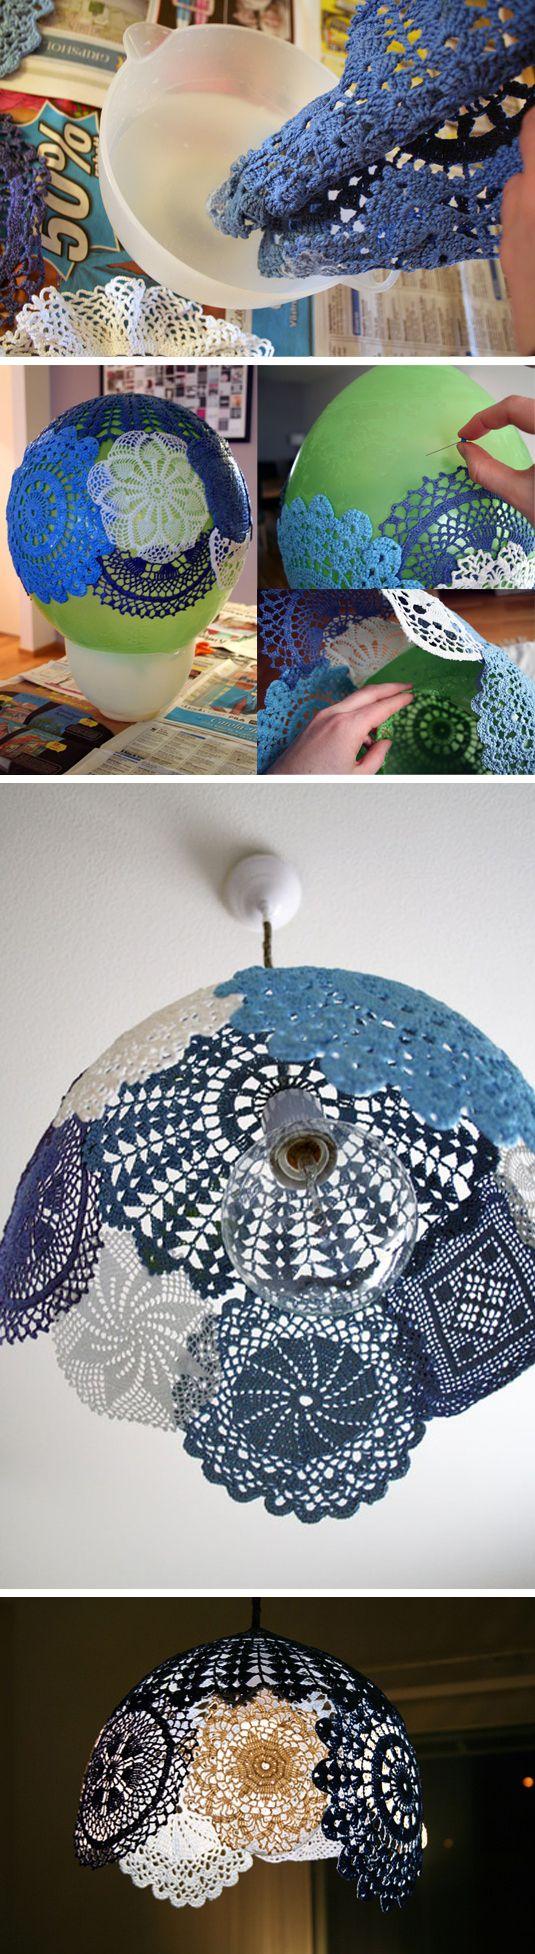 DIY light fixtures.